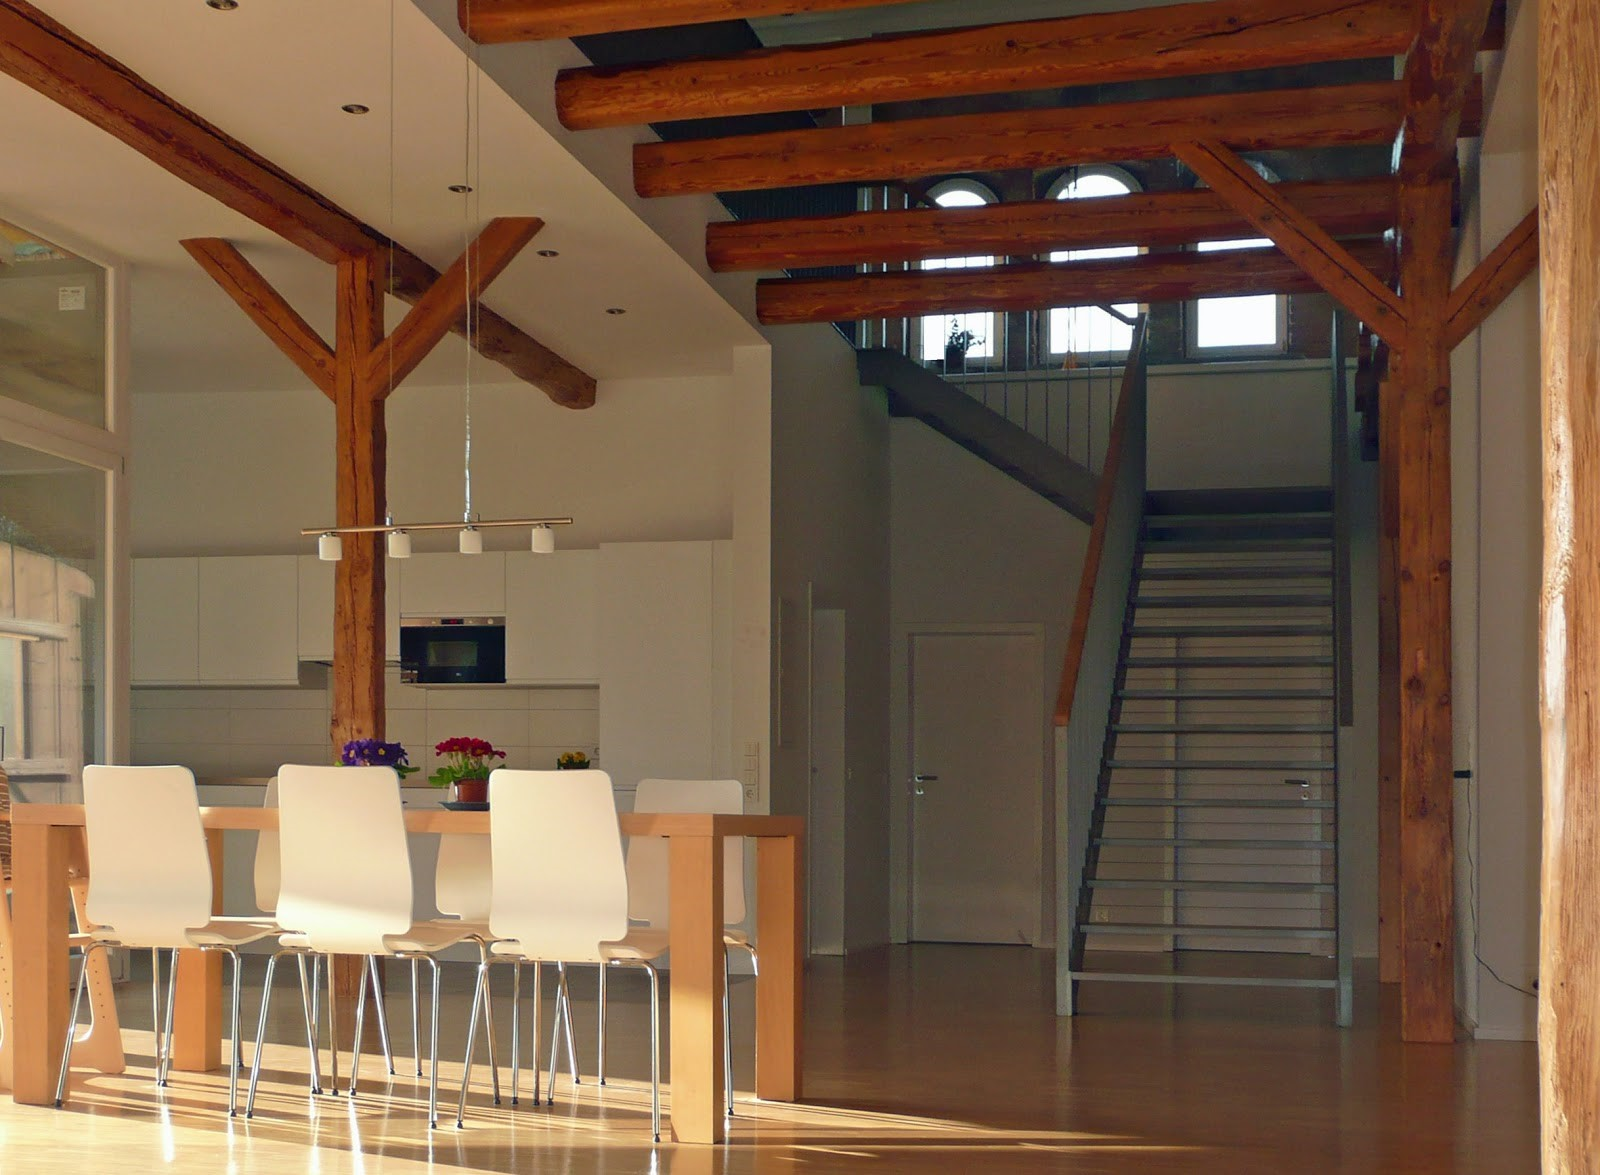 Scheunenhaus; Moderner Innenbau